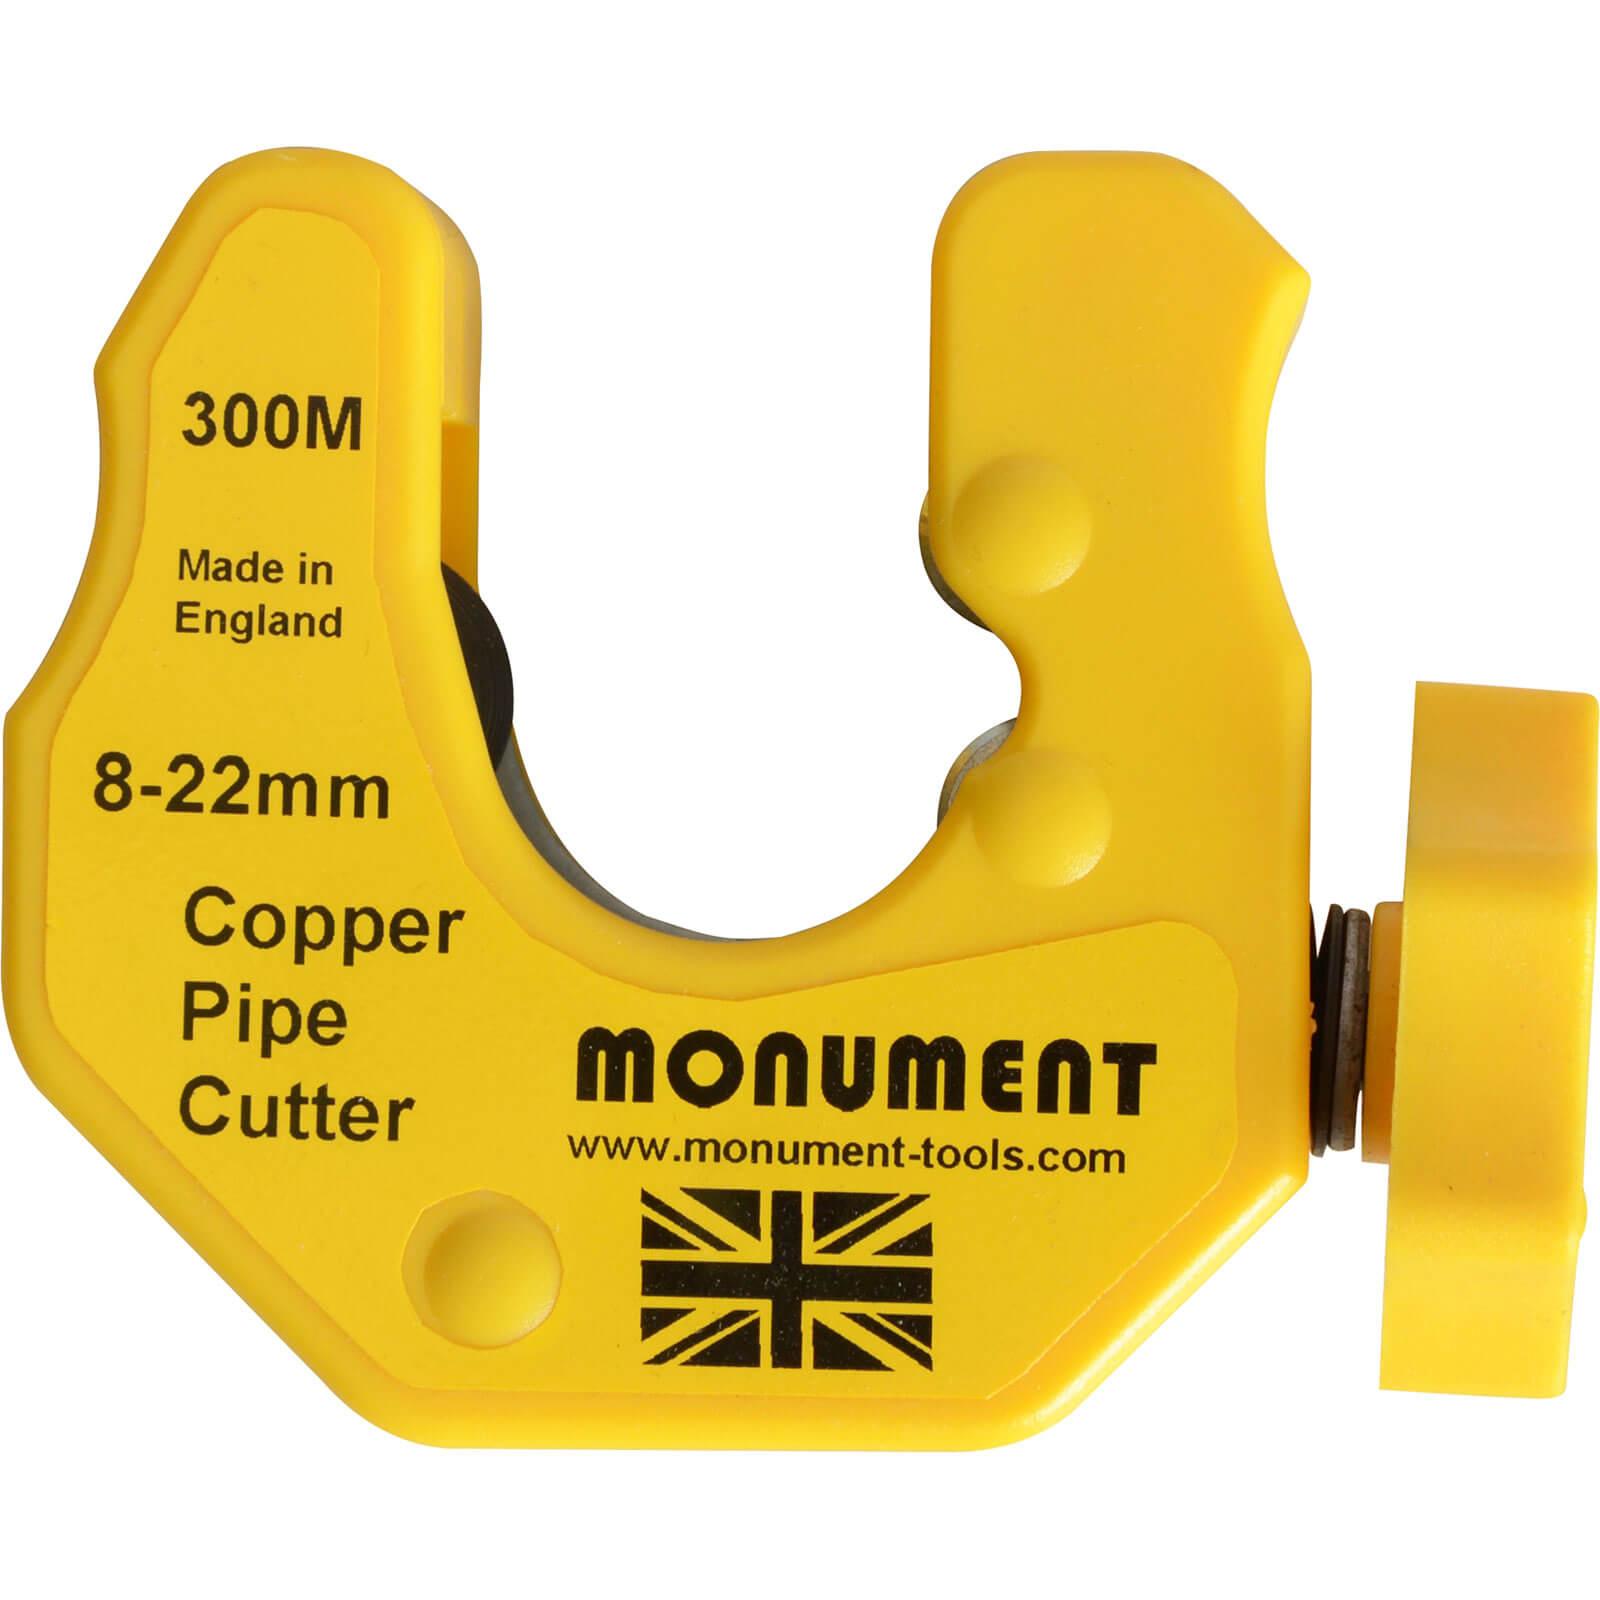 Monument 1806 L Autocut Pipe Cutter 6 mm